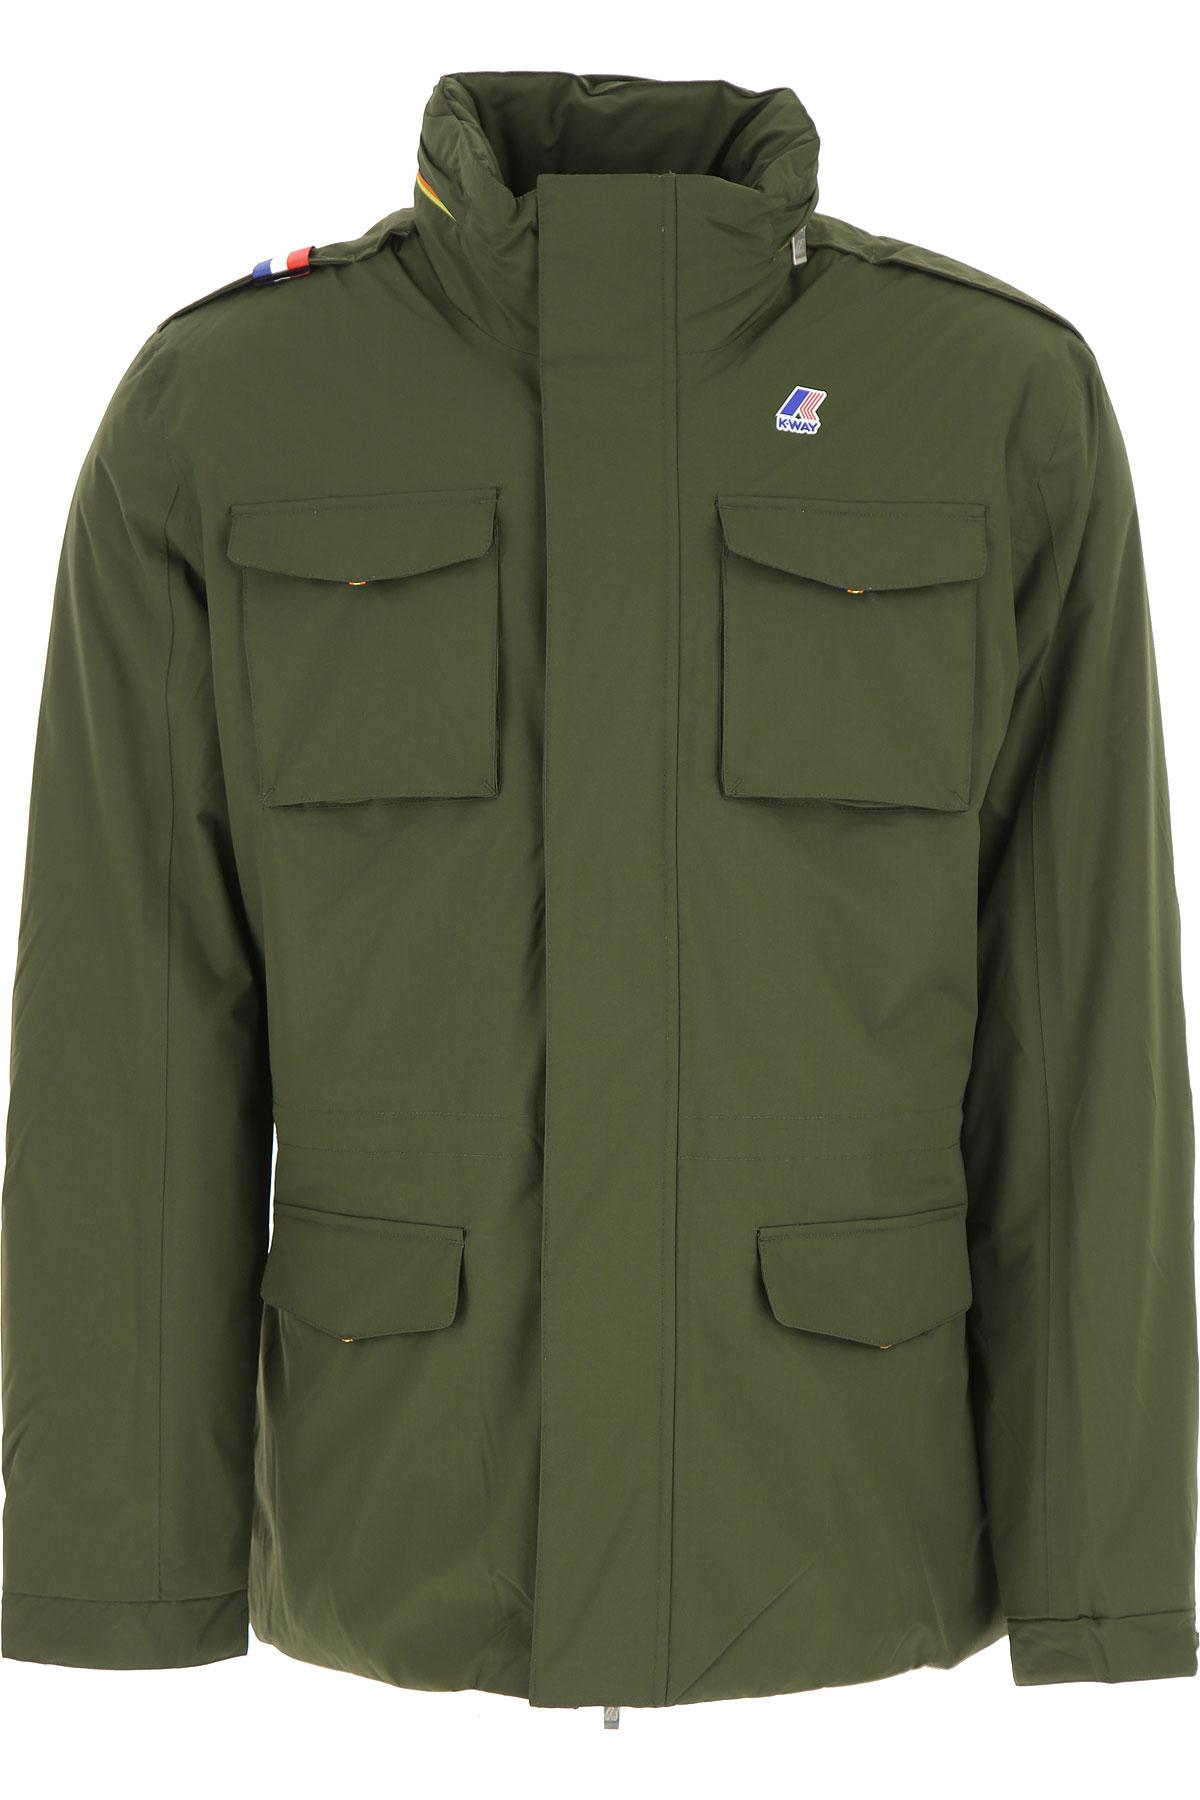 Image of K-Way Down Jacket for Men, Puffer Ski Jacket, Military Green, polyamide, 2017, L M S XXL